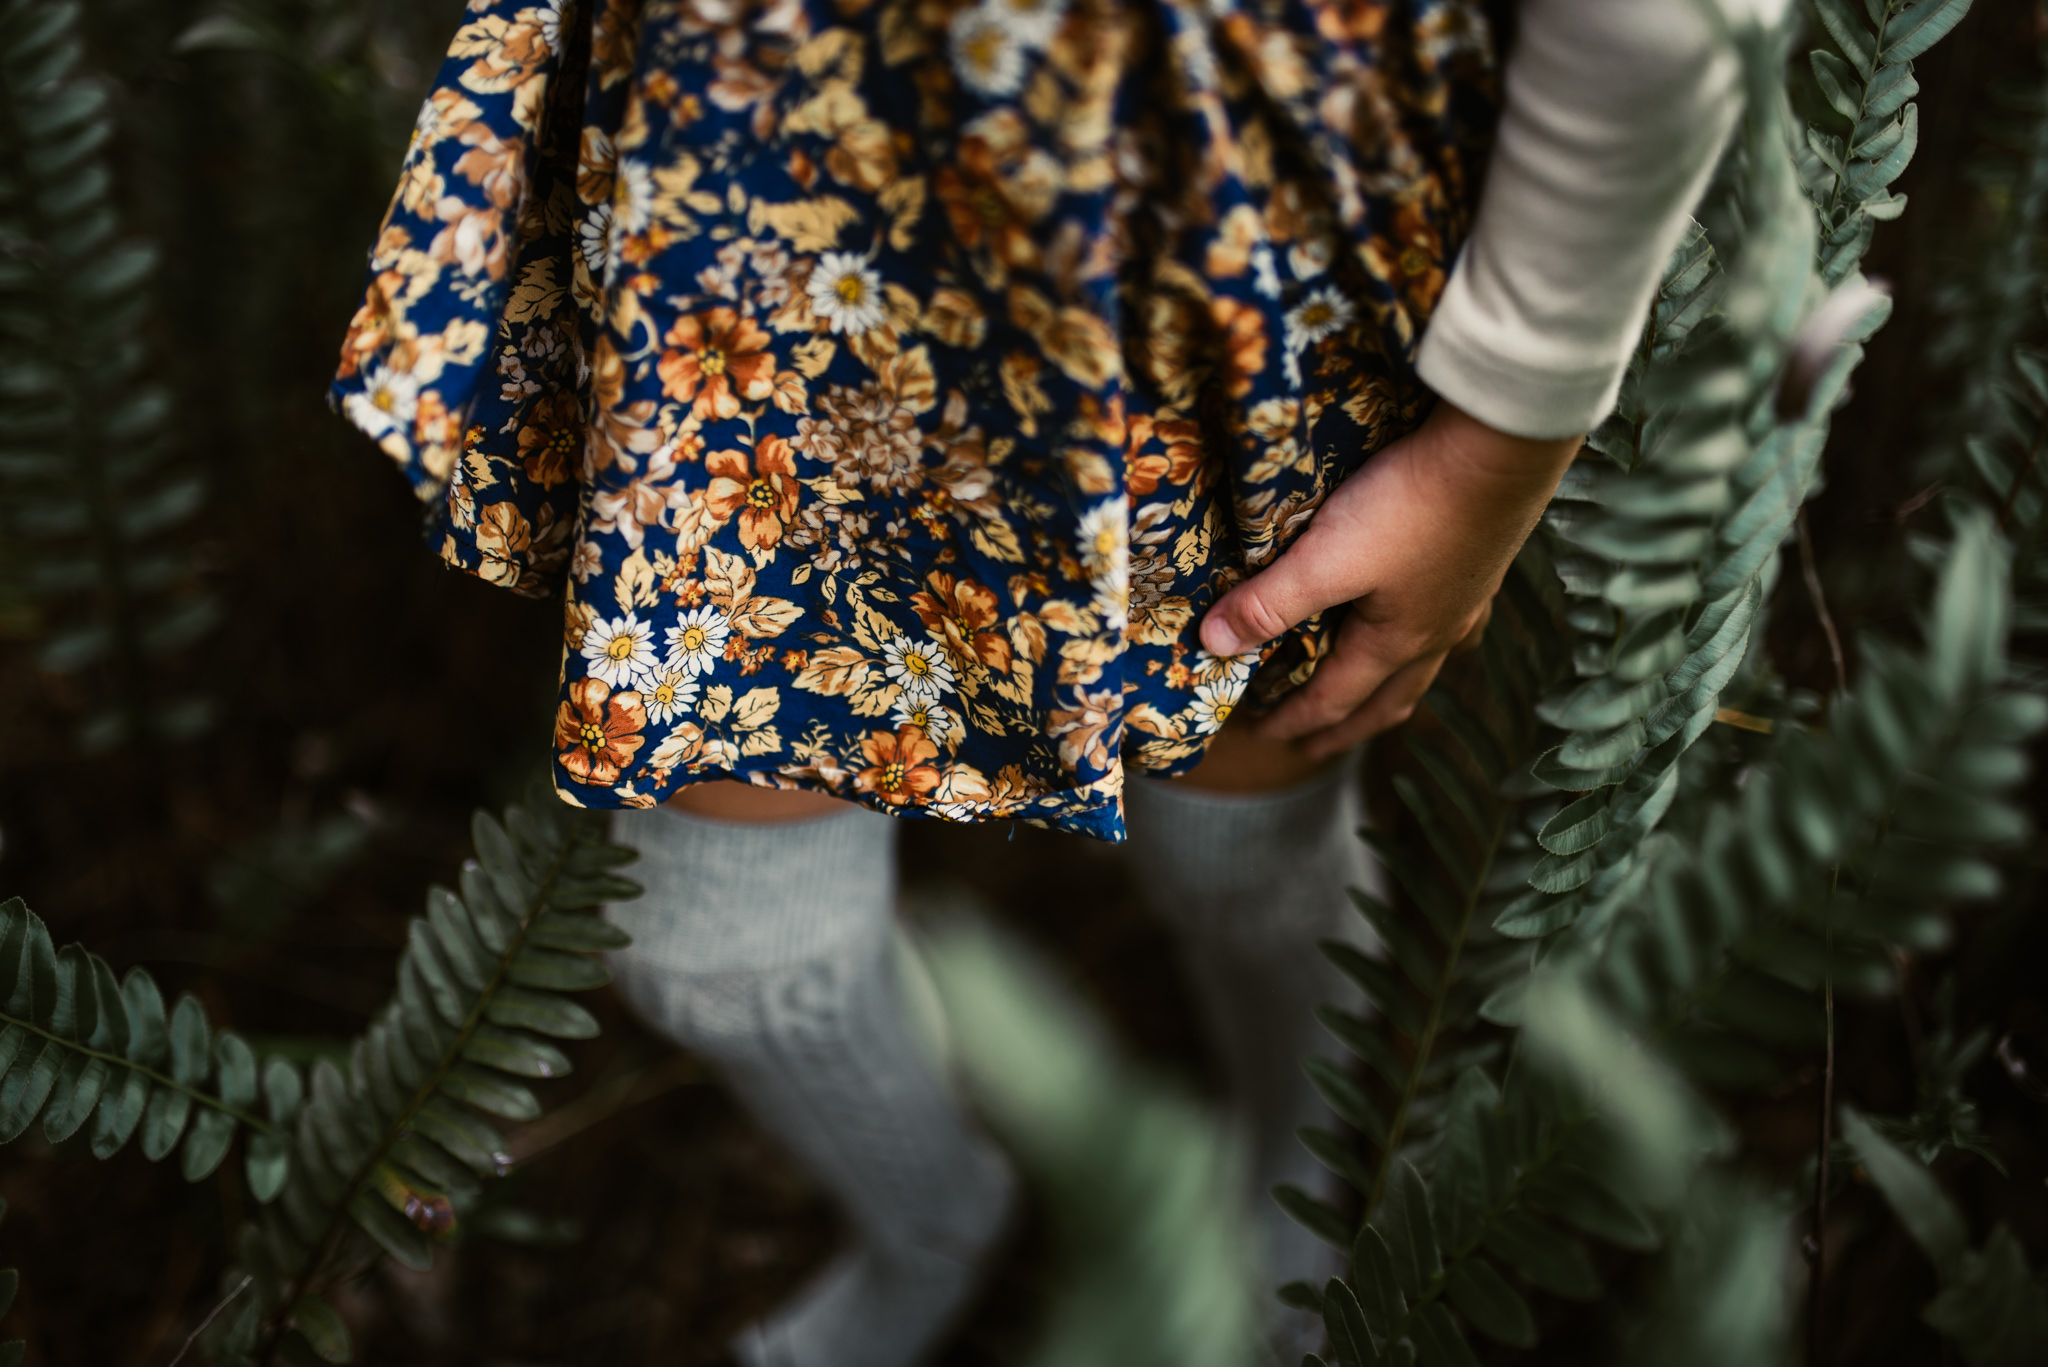 twyla jones photography - treasure coast florida - childrens adventure clothing commercial shoot--8.jpg